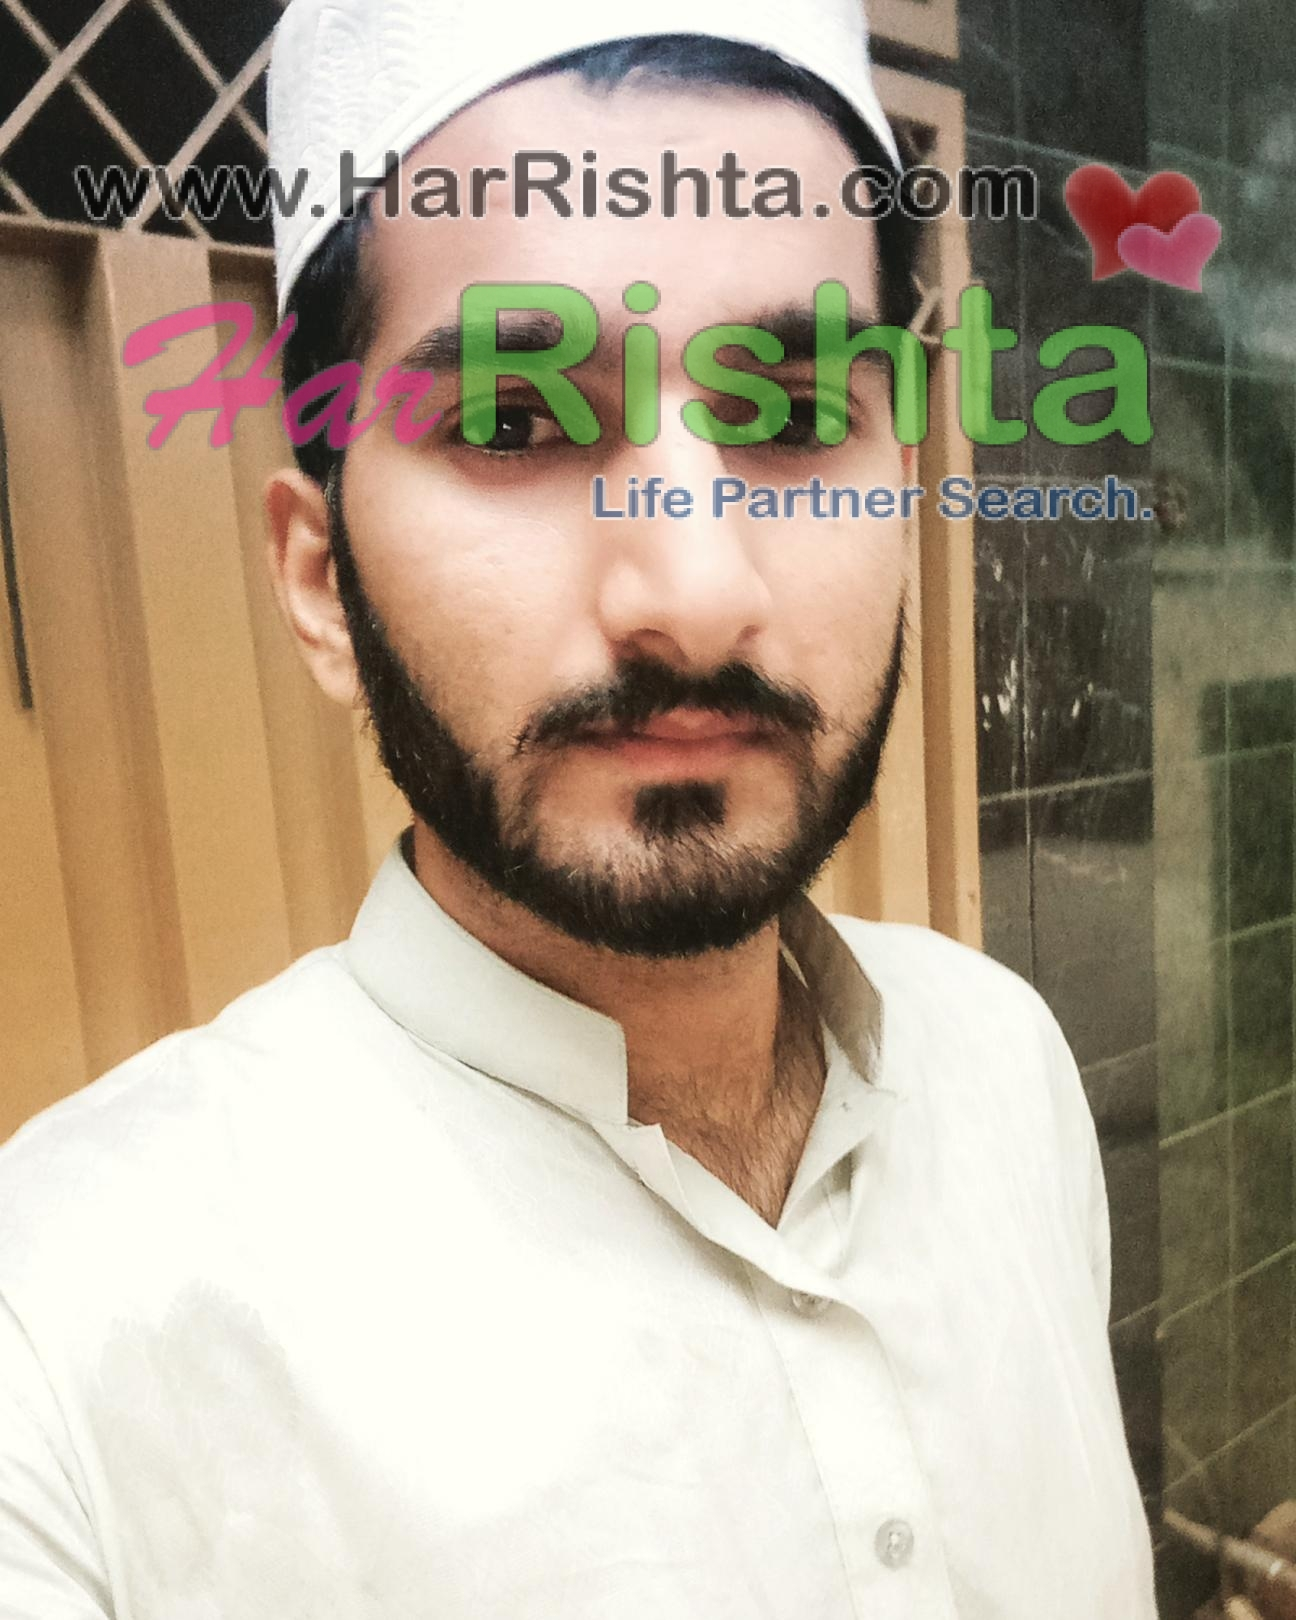 Alvi Boy Rishta in Faisalabad